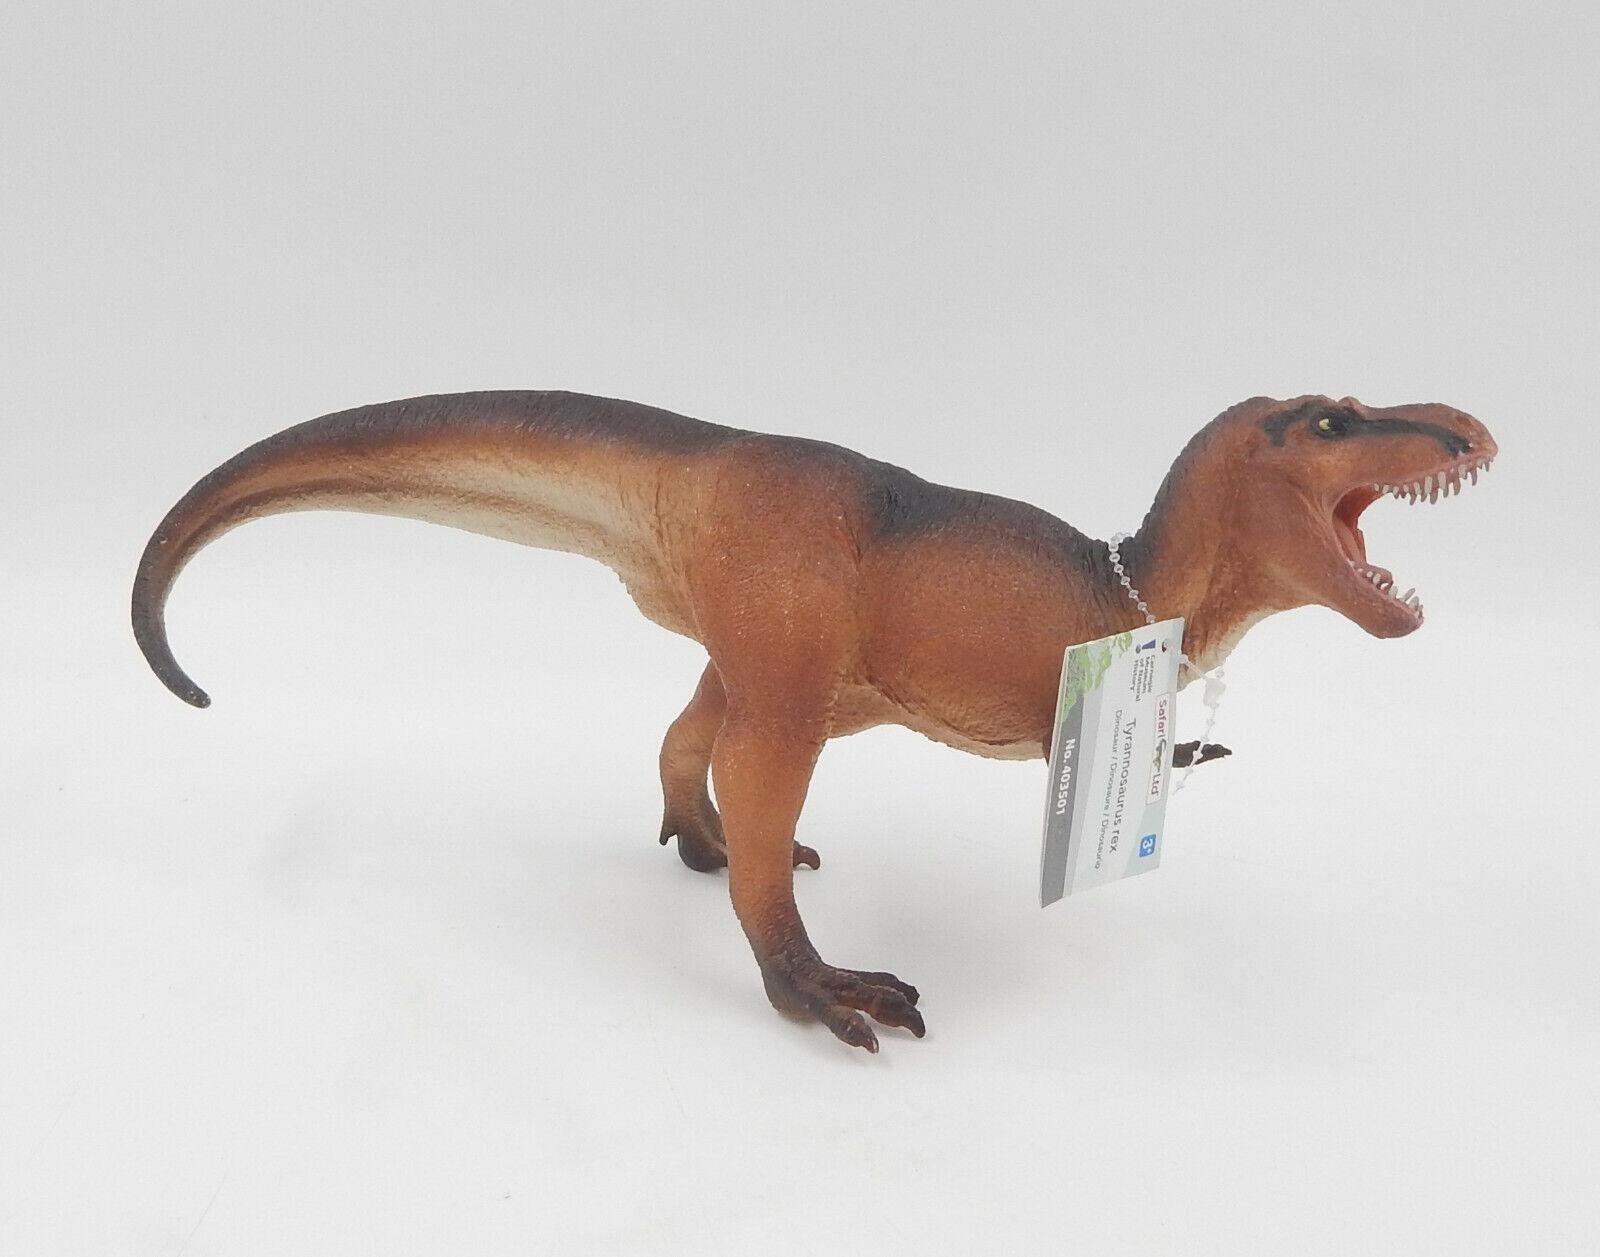 Safari Ltd. Carnegie 403501 Tyrannosaurus Rex - Dinosaurier Figur dinosaur